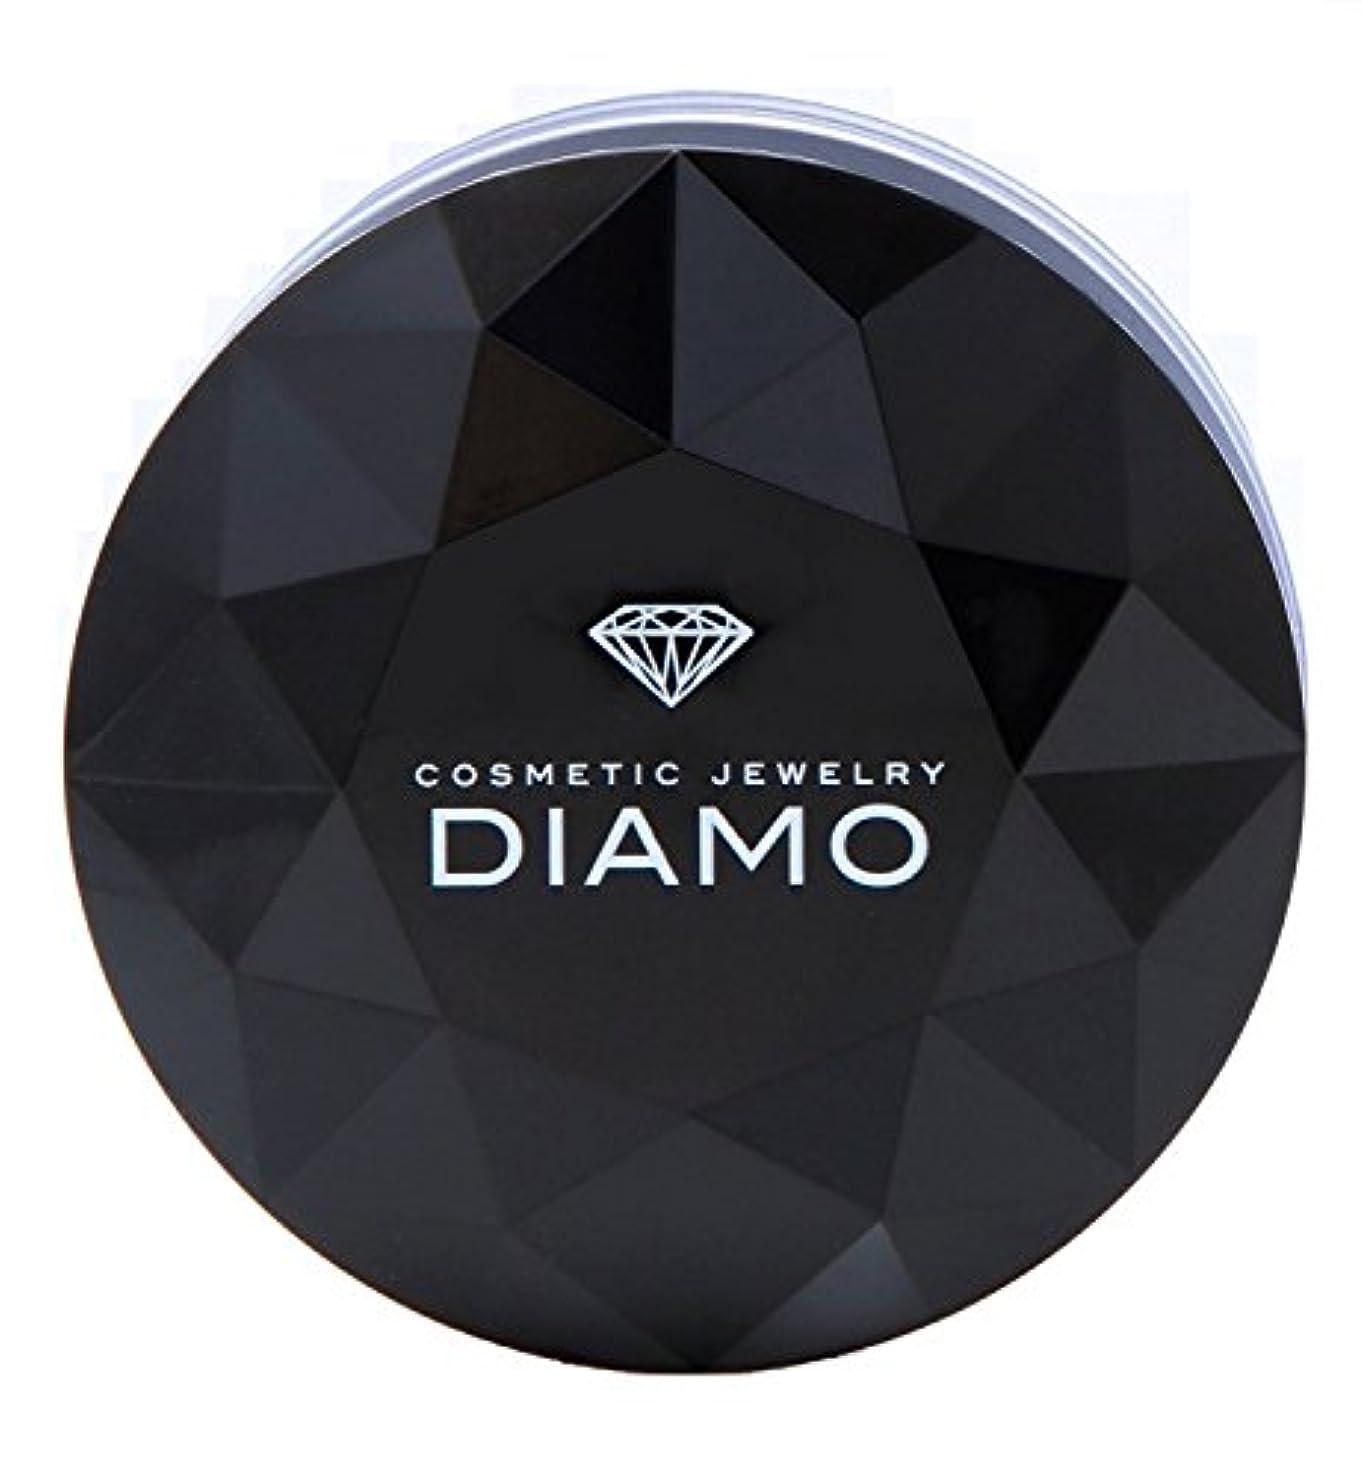 DIAMO (ディアモ) ルースパウダー 8g